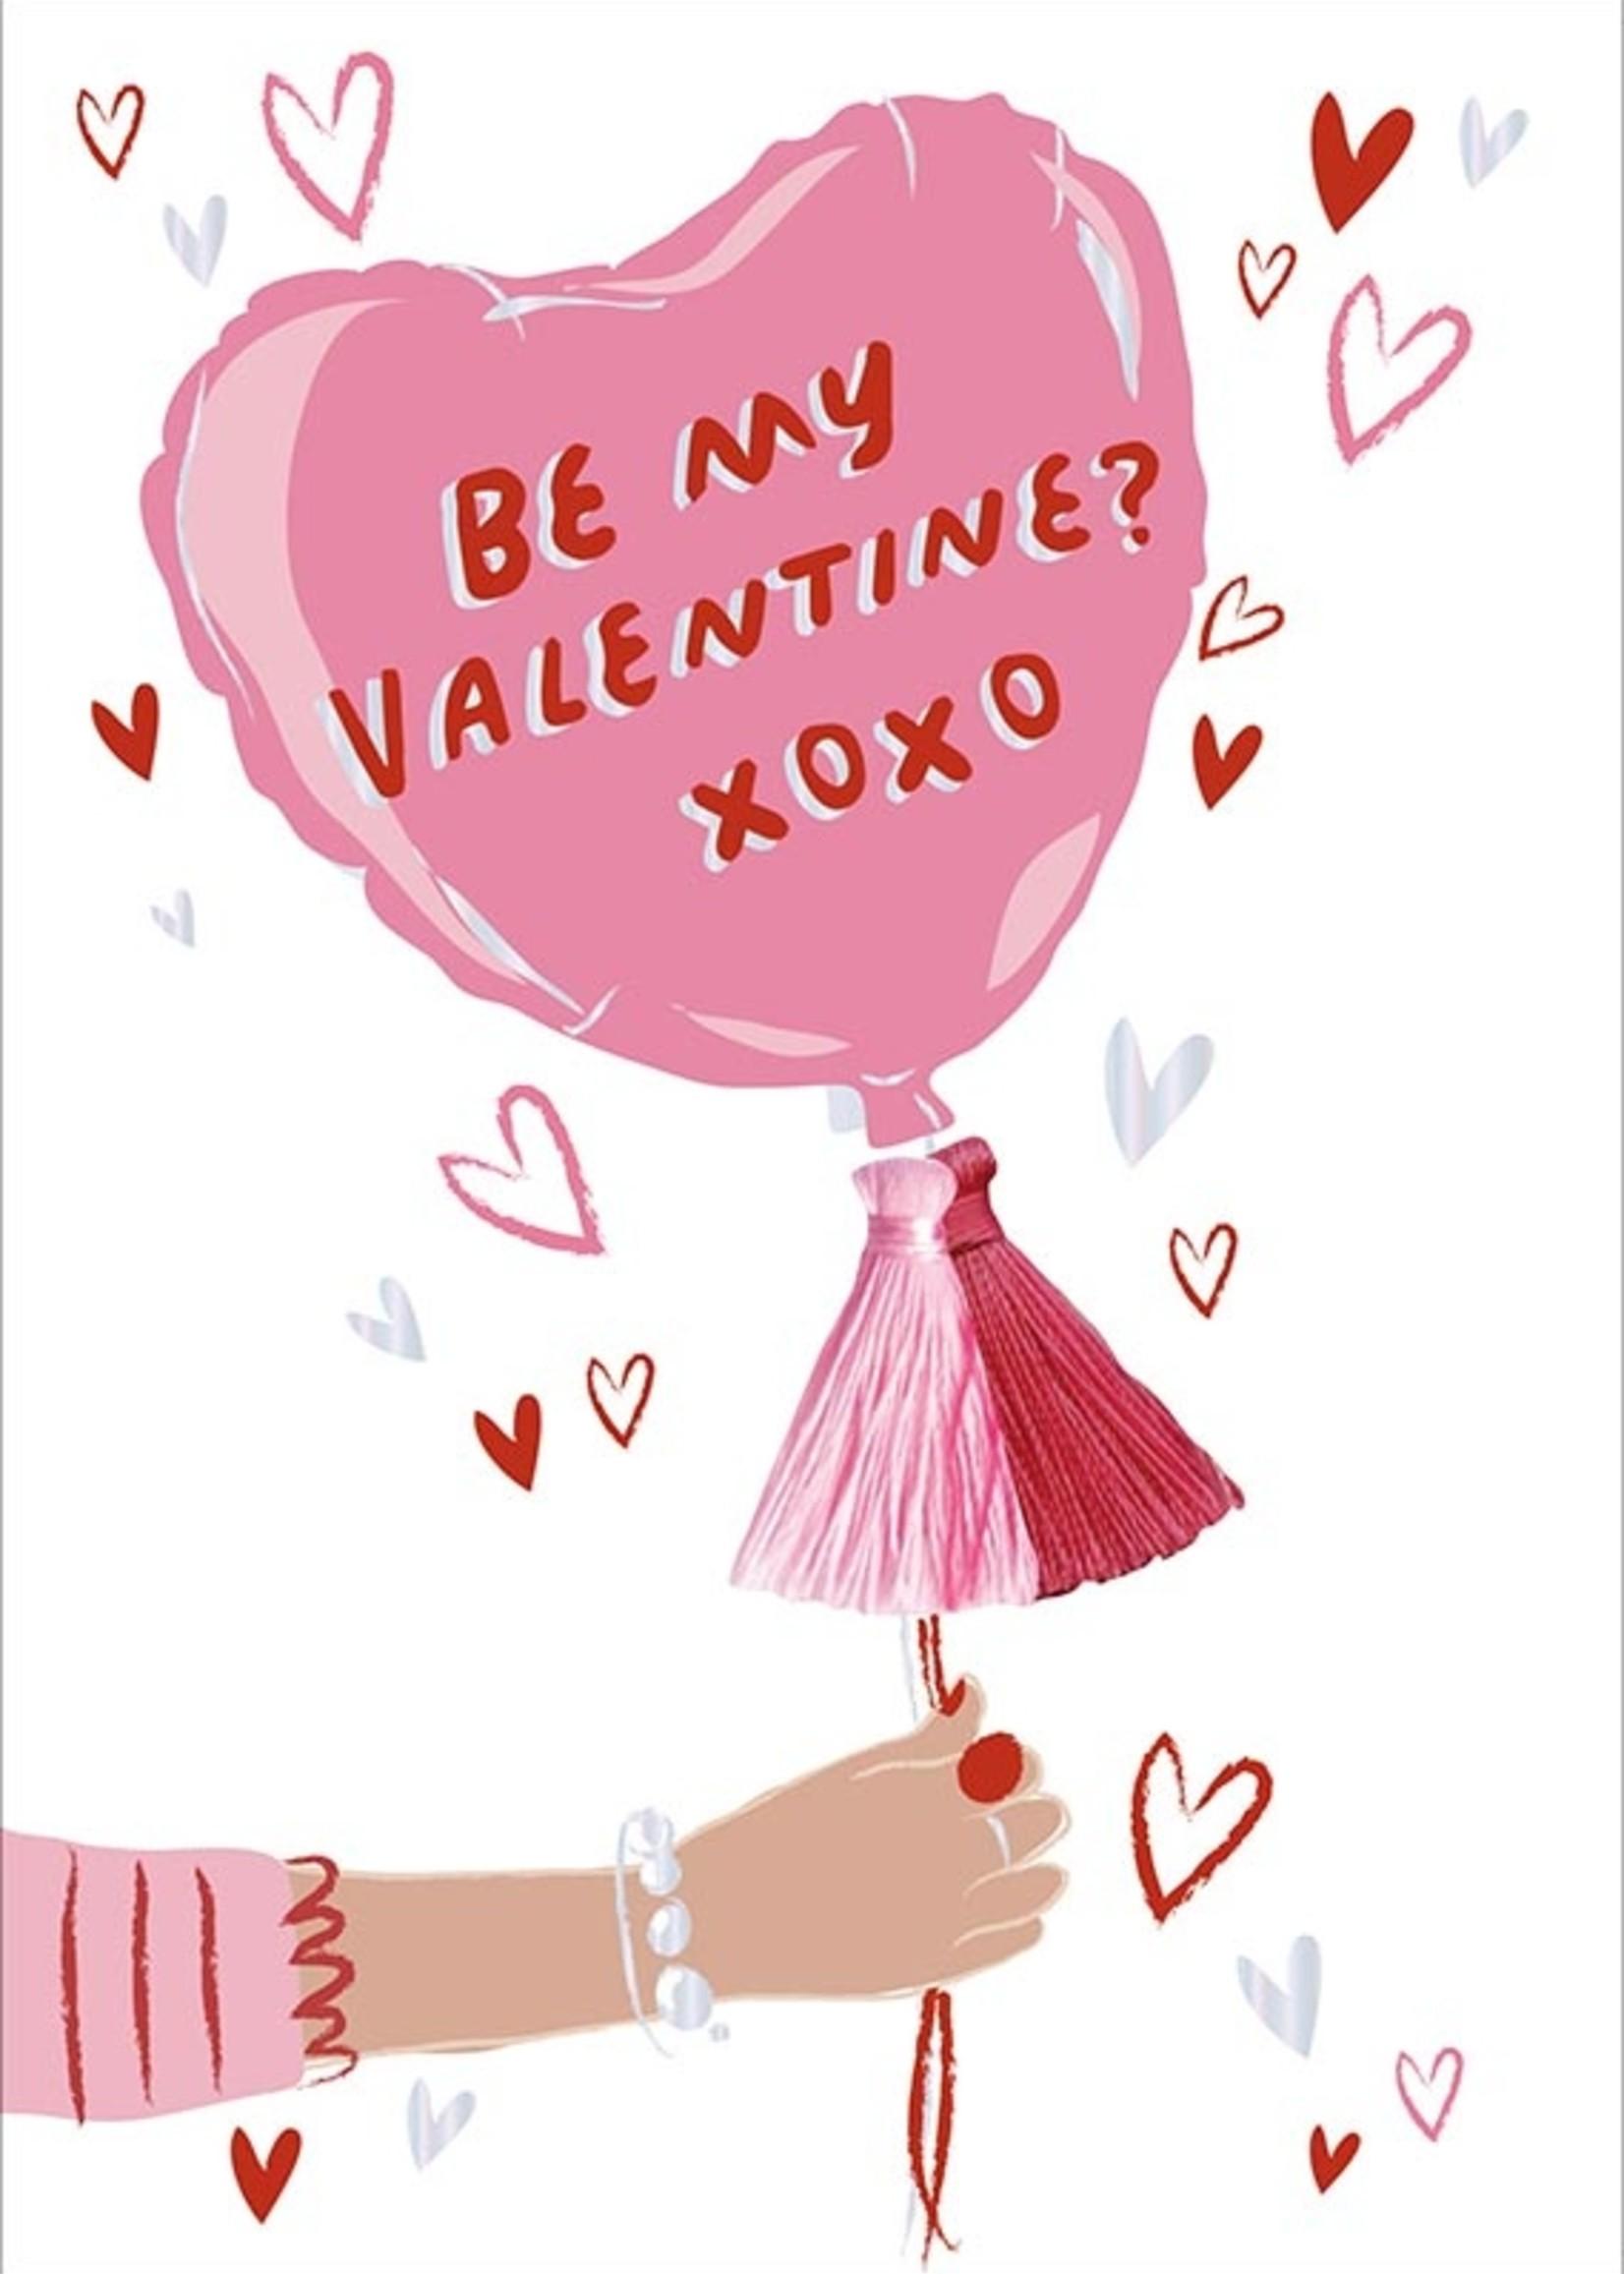 Card VDAY Be My Valentine Balloon